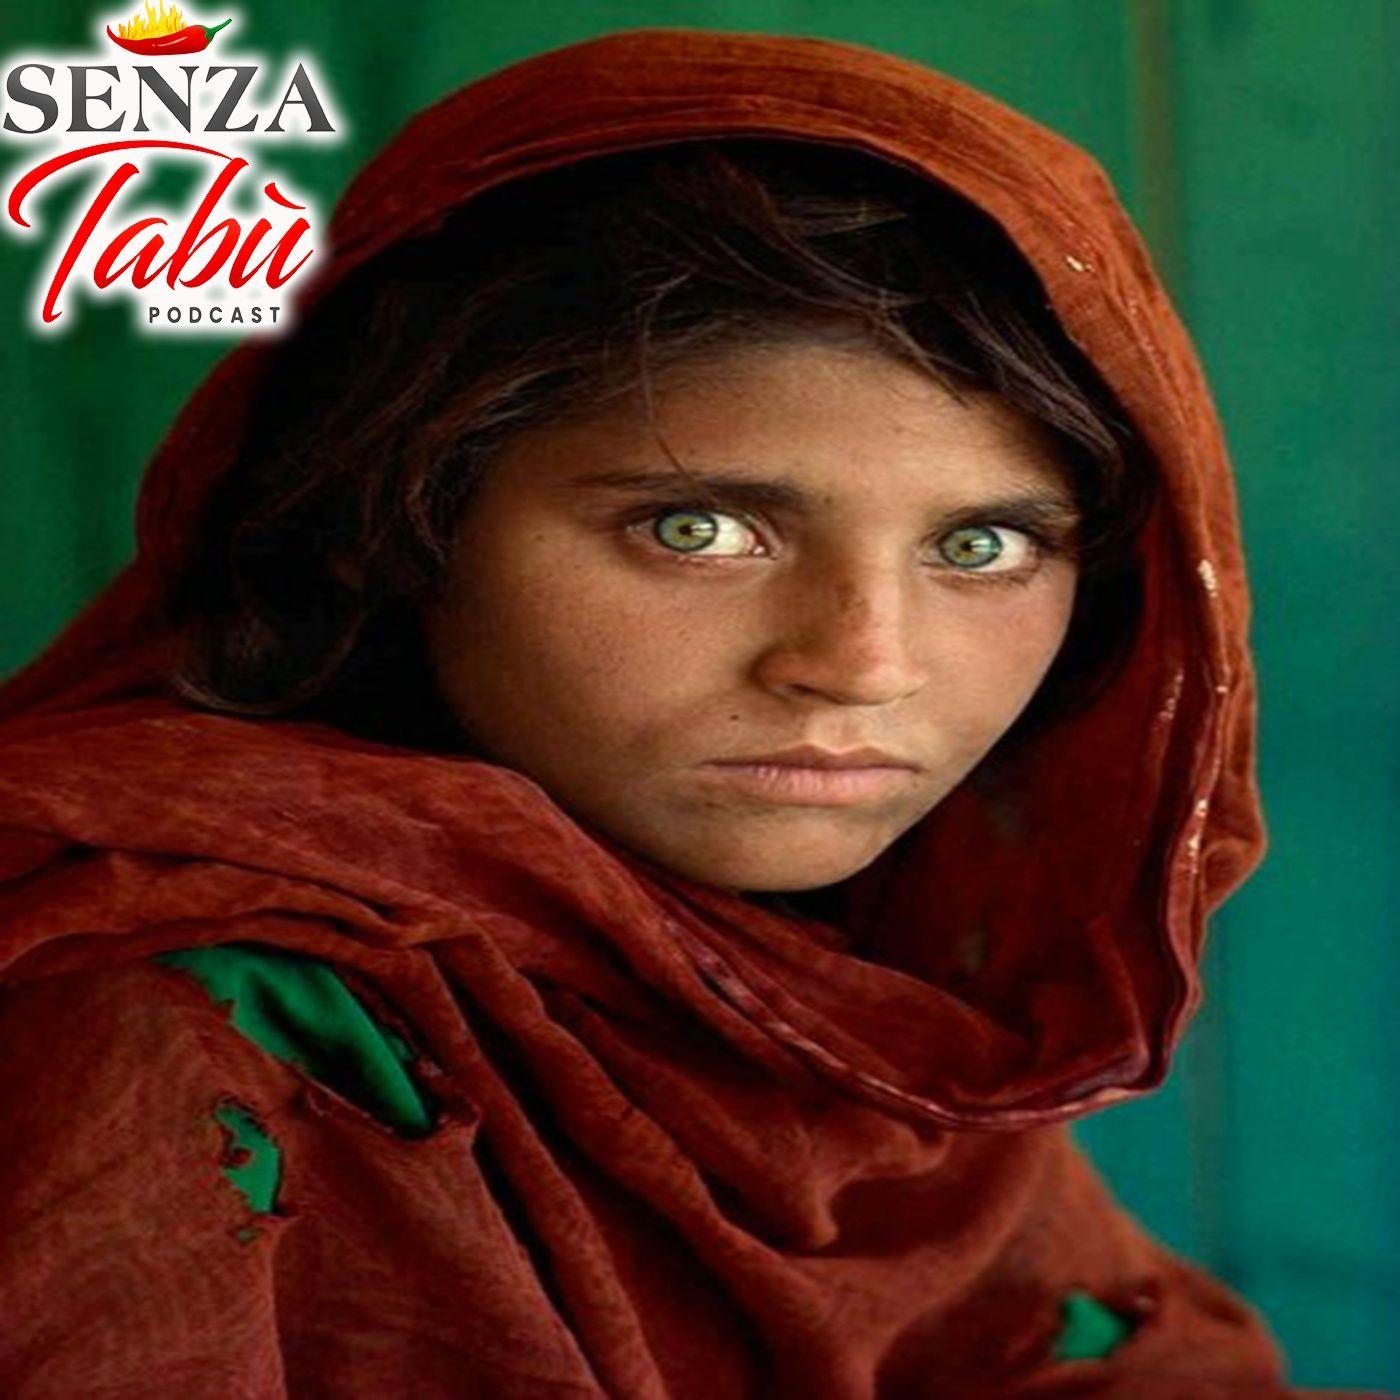 AFGHANISTAN PRIMA E DOPO I TALEBANI ⚠️ LA VERITÀ